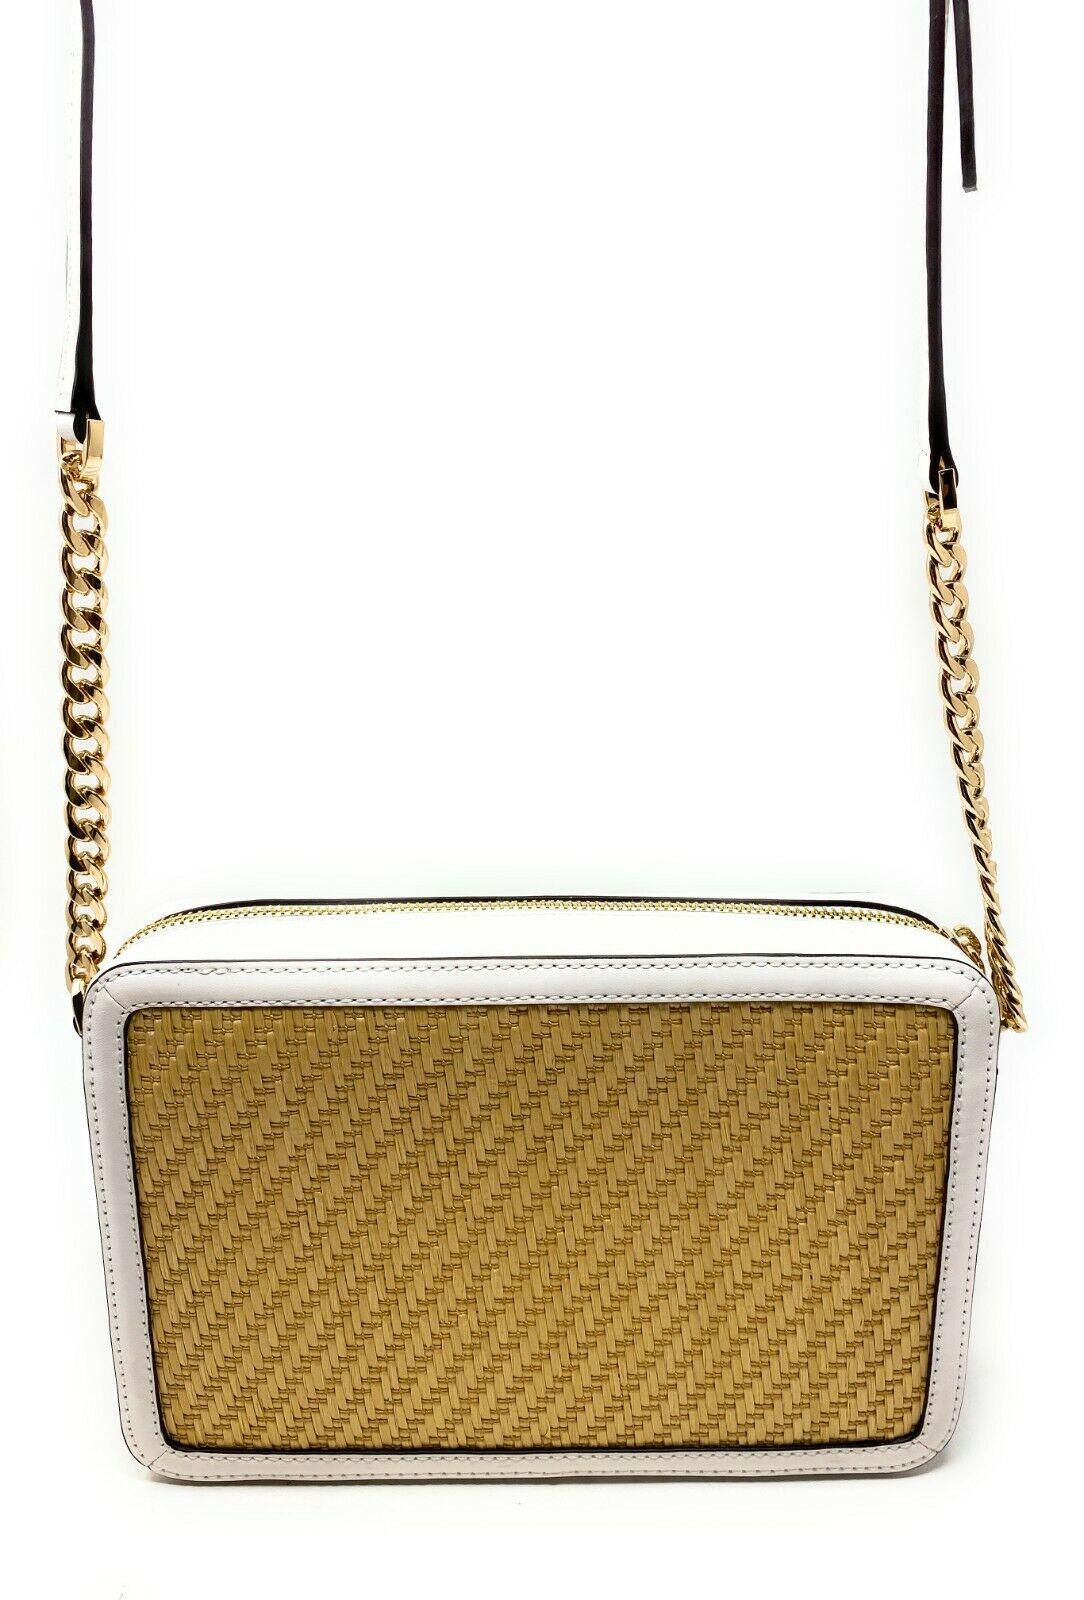 thumbnail 23 - Michael Kors Jet Set Item Large East West Crossbody Chain Handbag Clutch $298